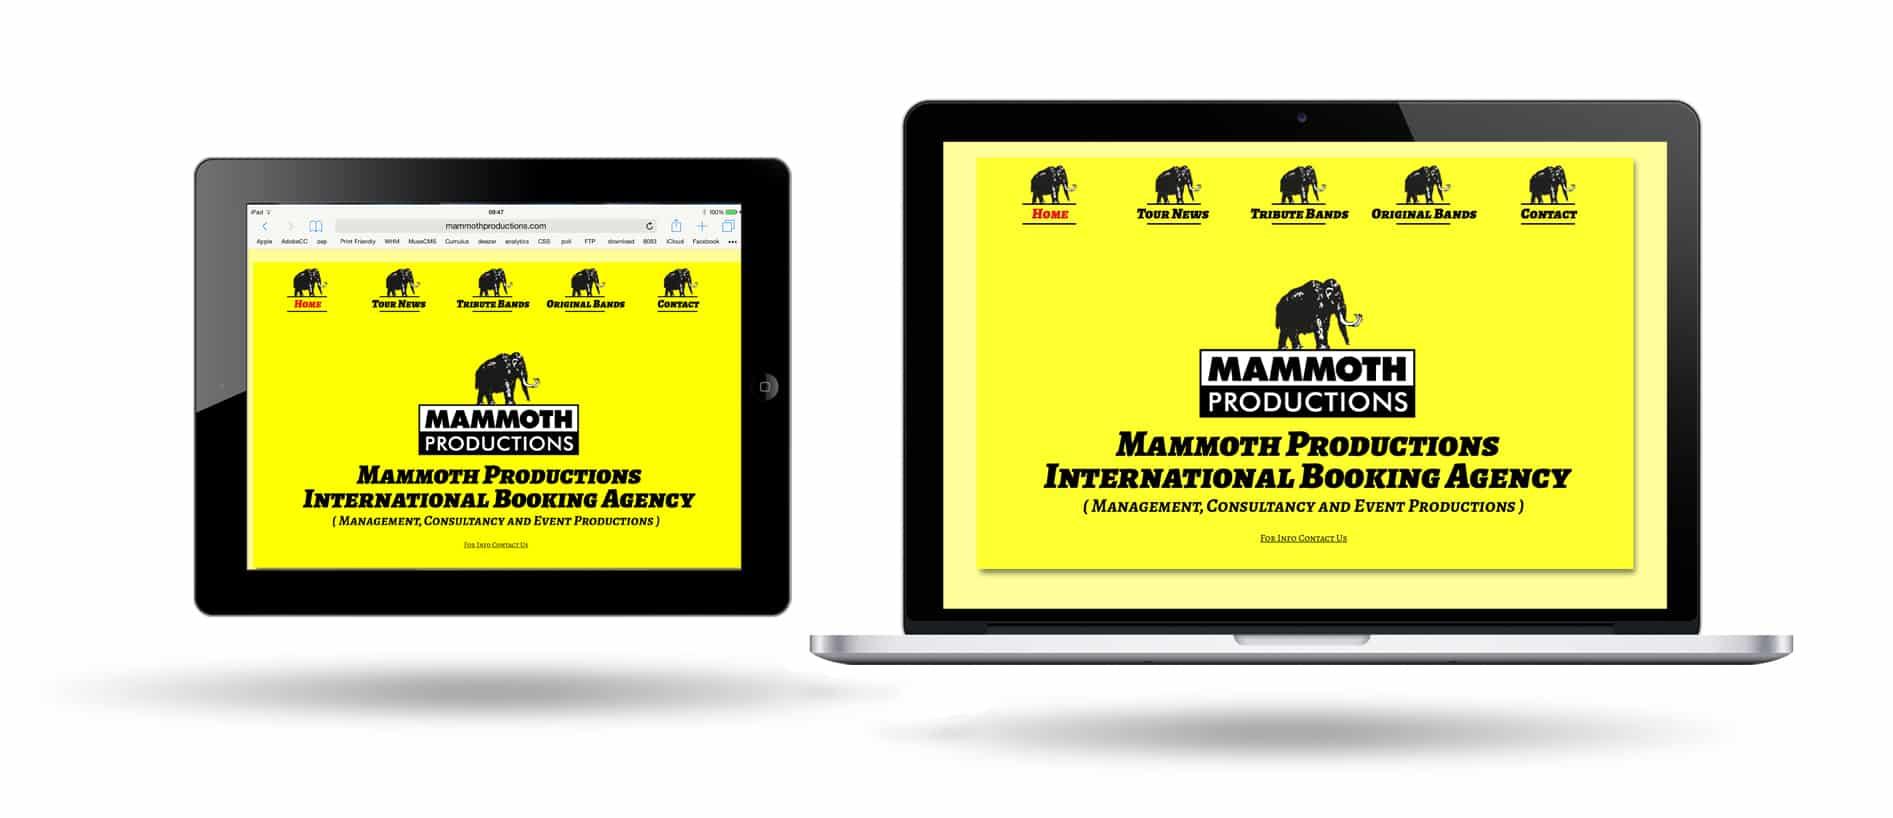 ipad-lig-laptop-mammothproductions